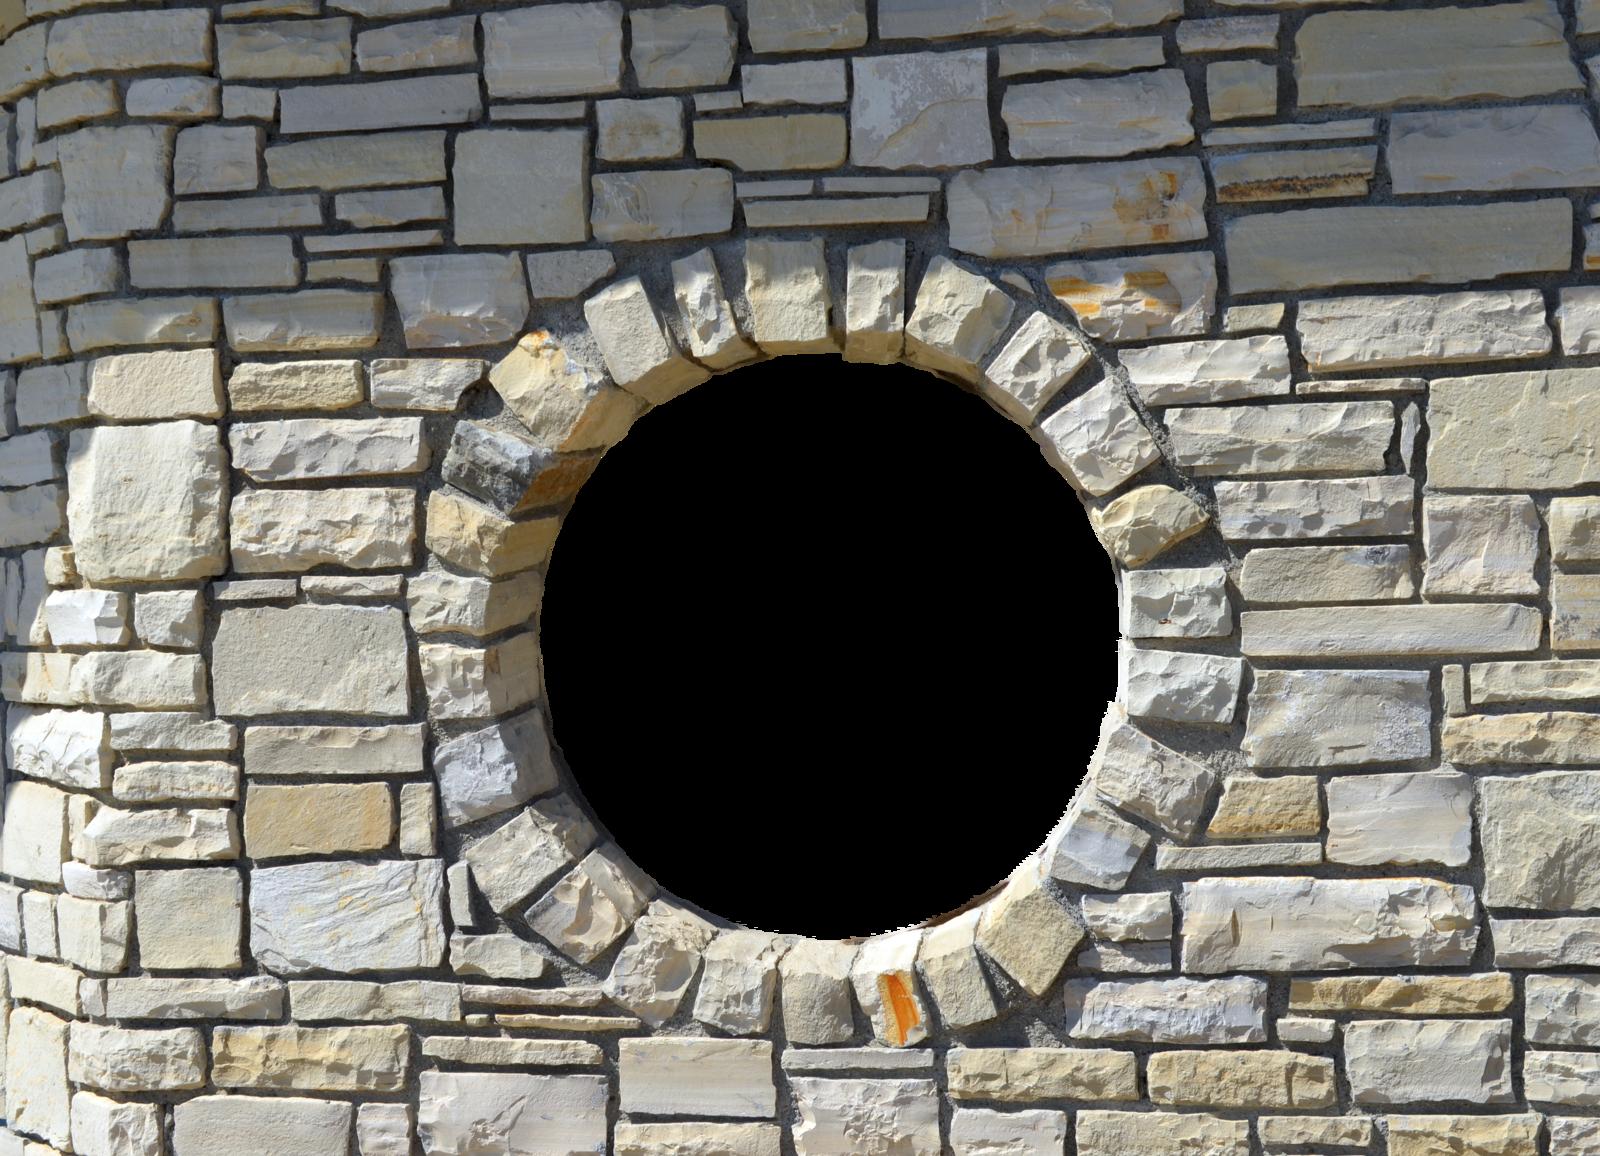 Brick Png image #39827